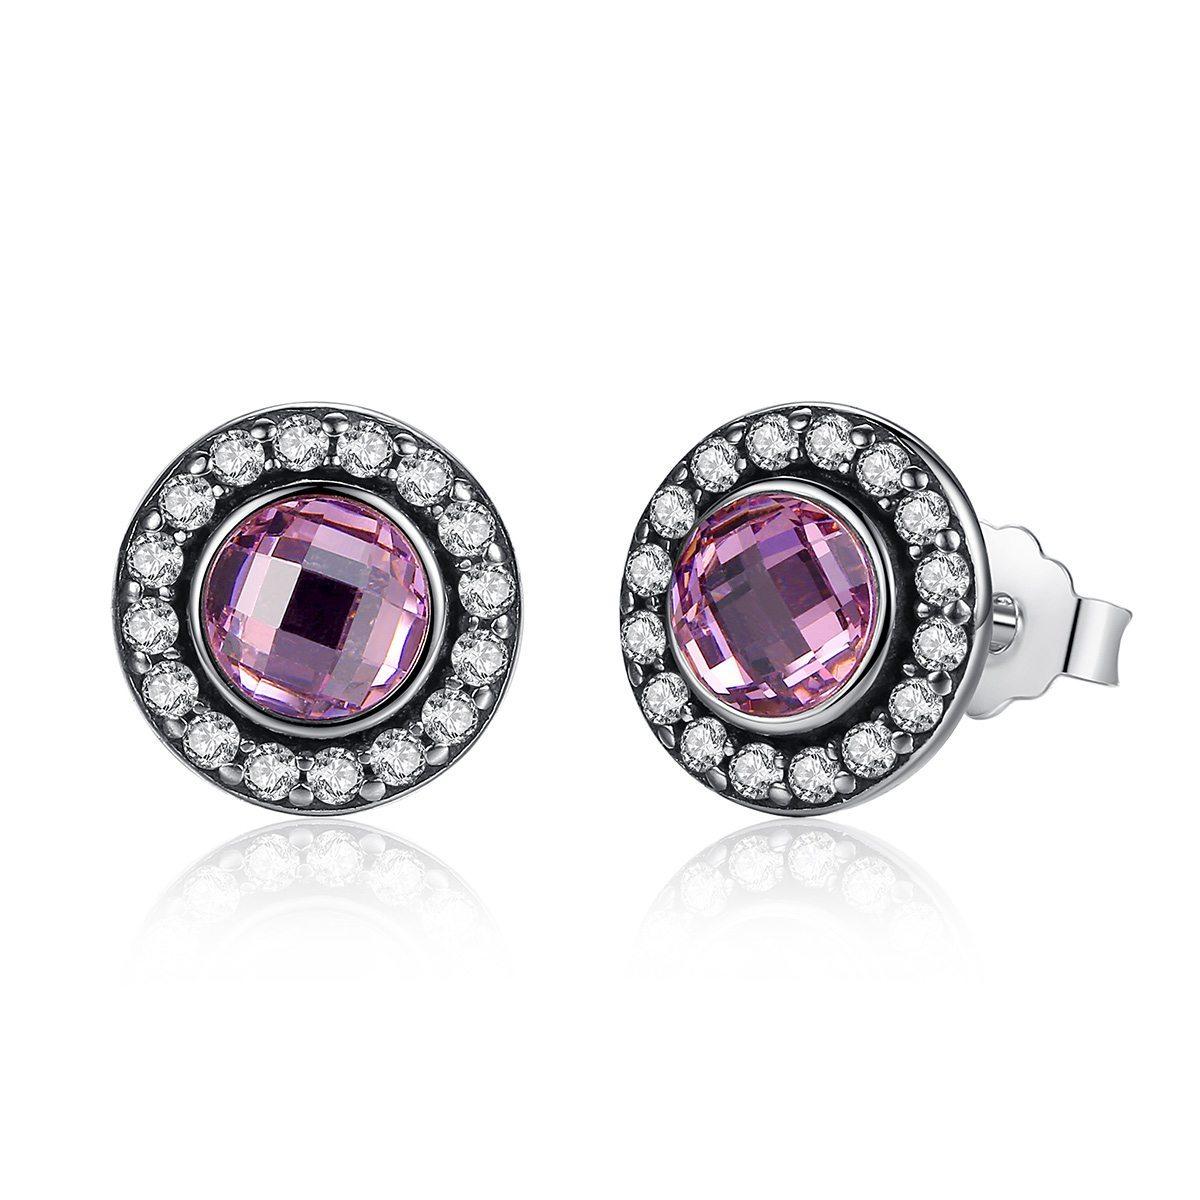 Great round earrings